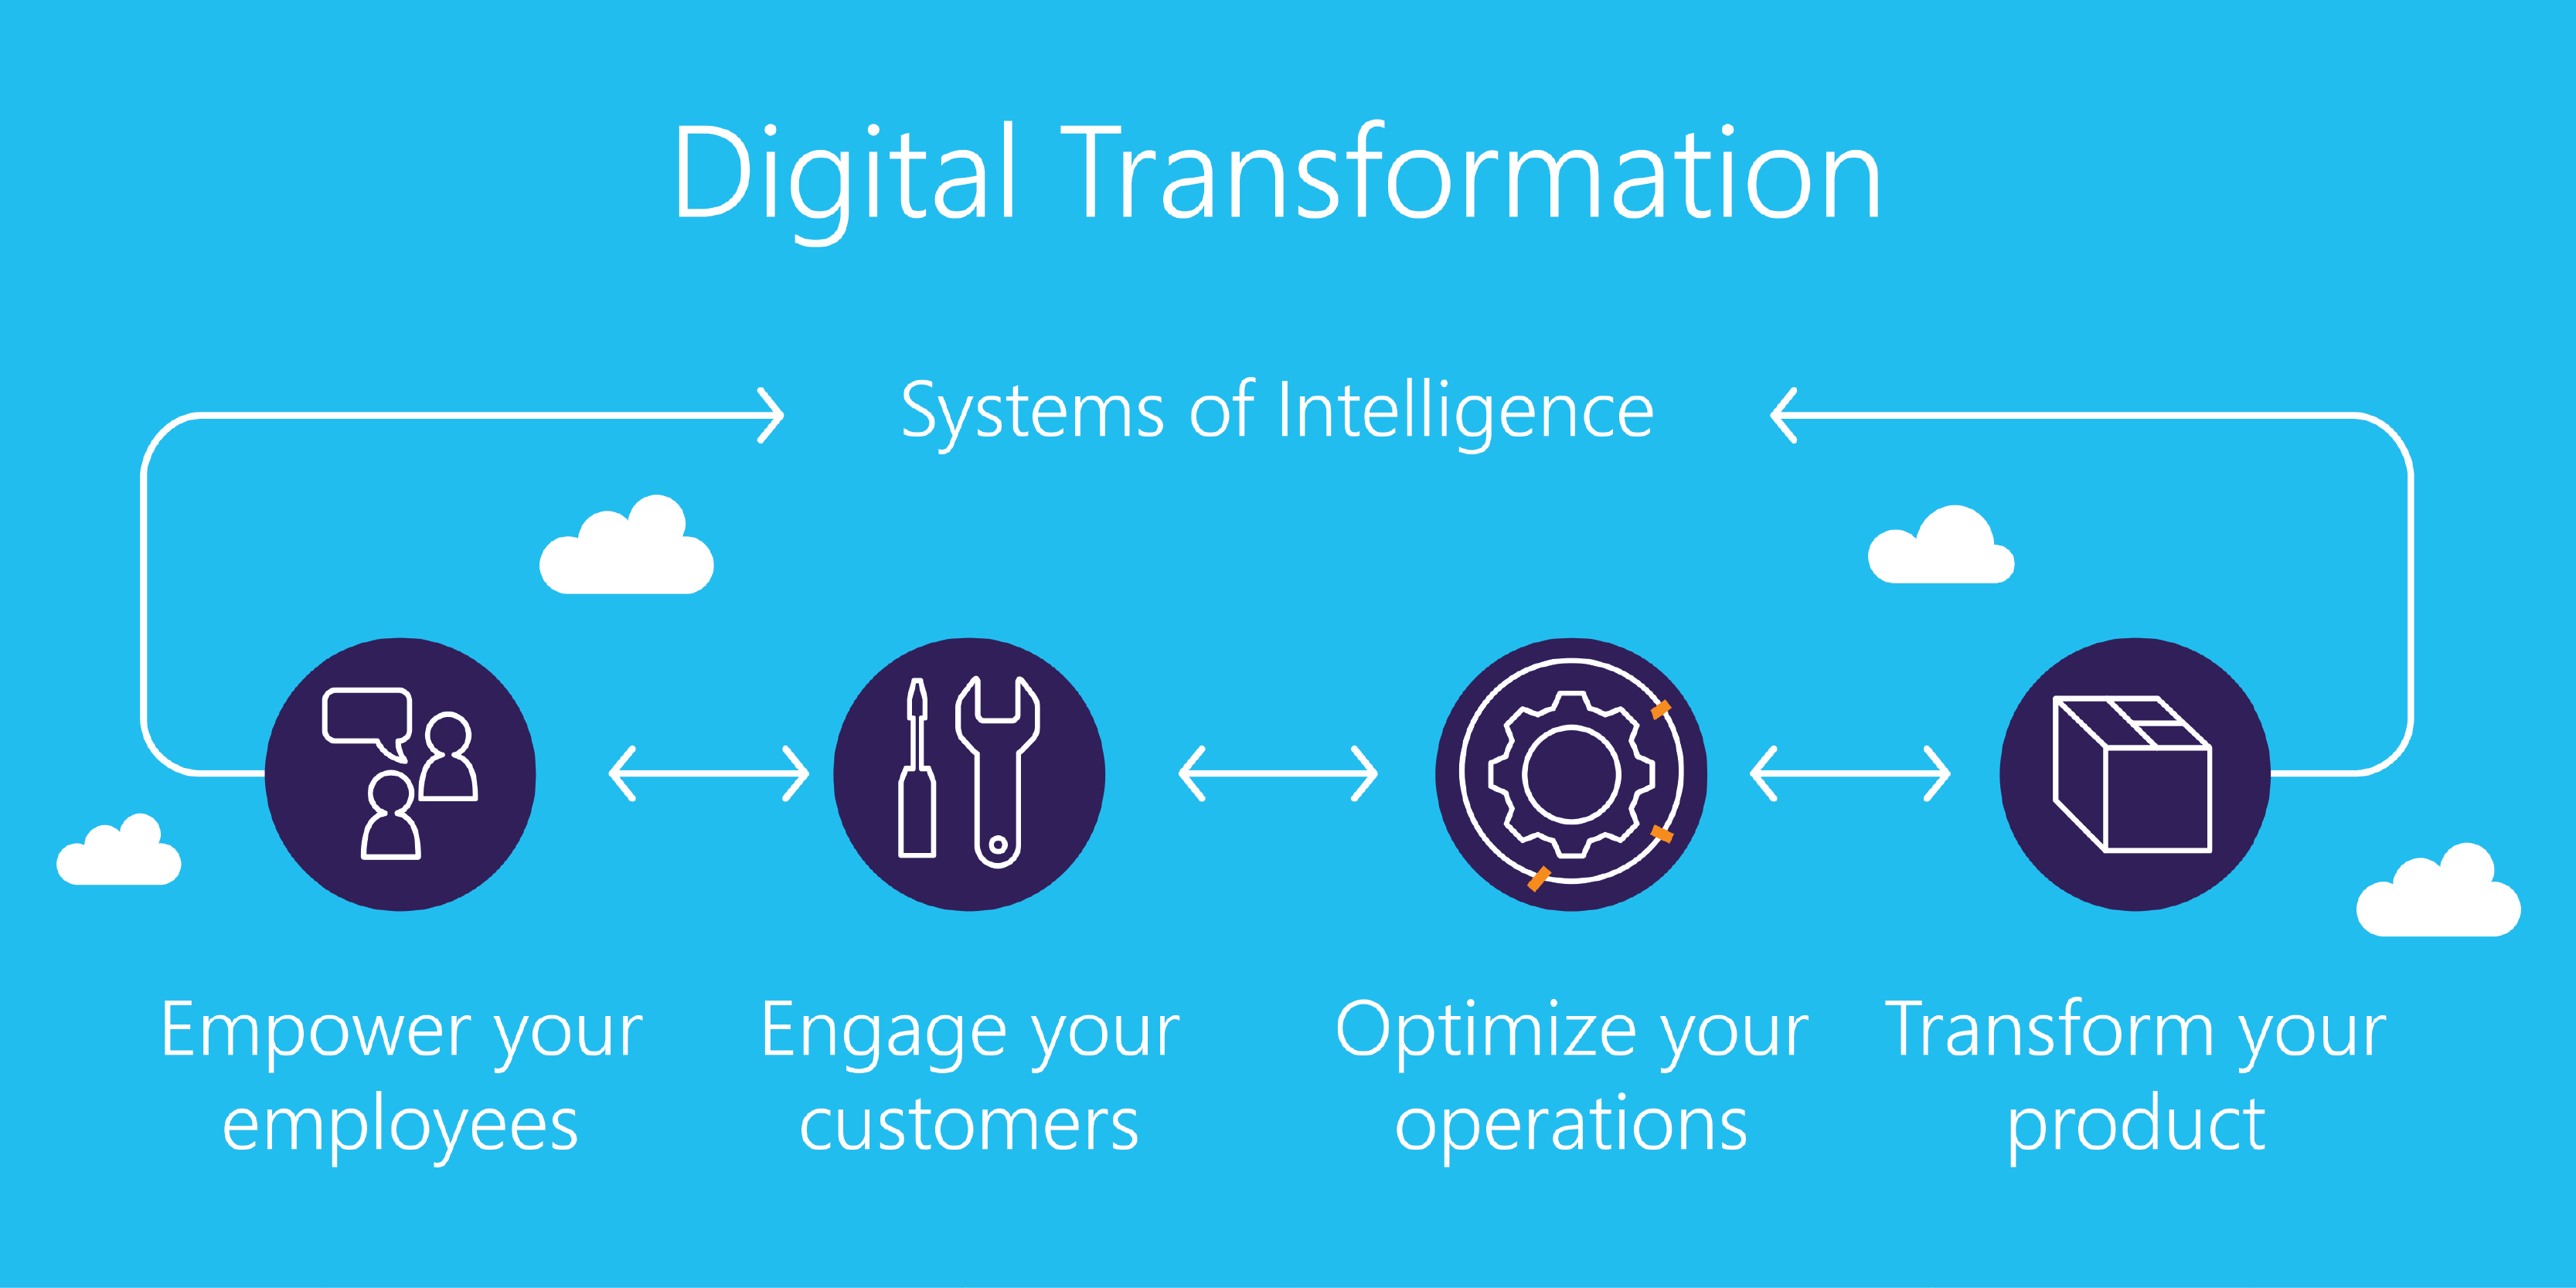 Digital Transformation Training in McAllen, WA | Introduction to Digital Transformation training for beginners | Getting started with Digital Transformation | What is Digital Transformation | January 20 - February 12, 2020